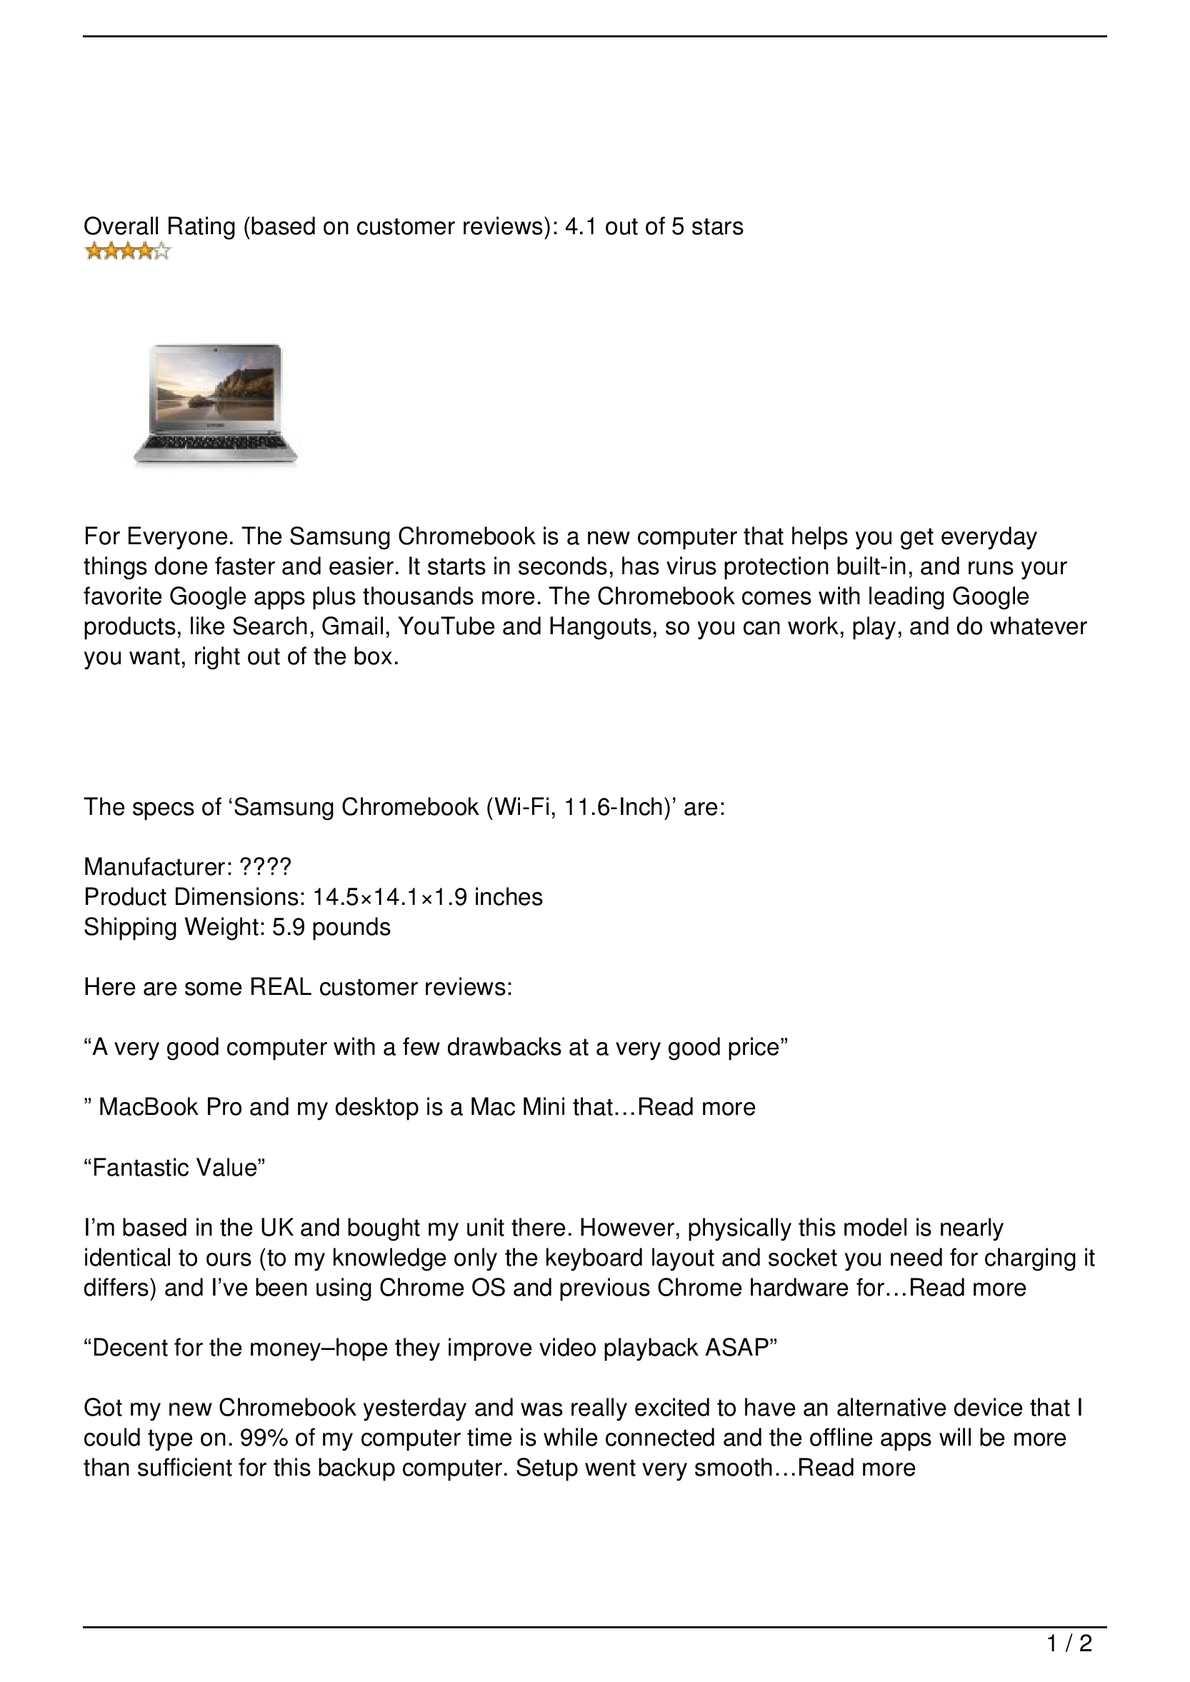 Calaméo - Samsung Chromebook (Wi-Fi, 11 6-Inch)